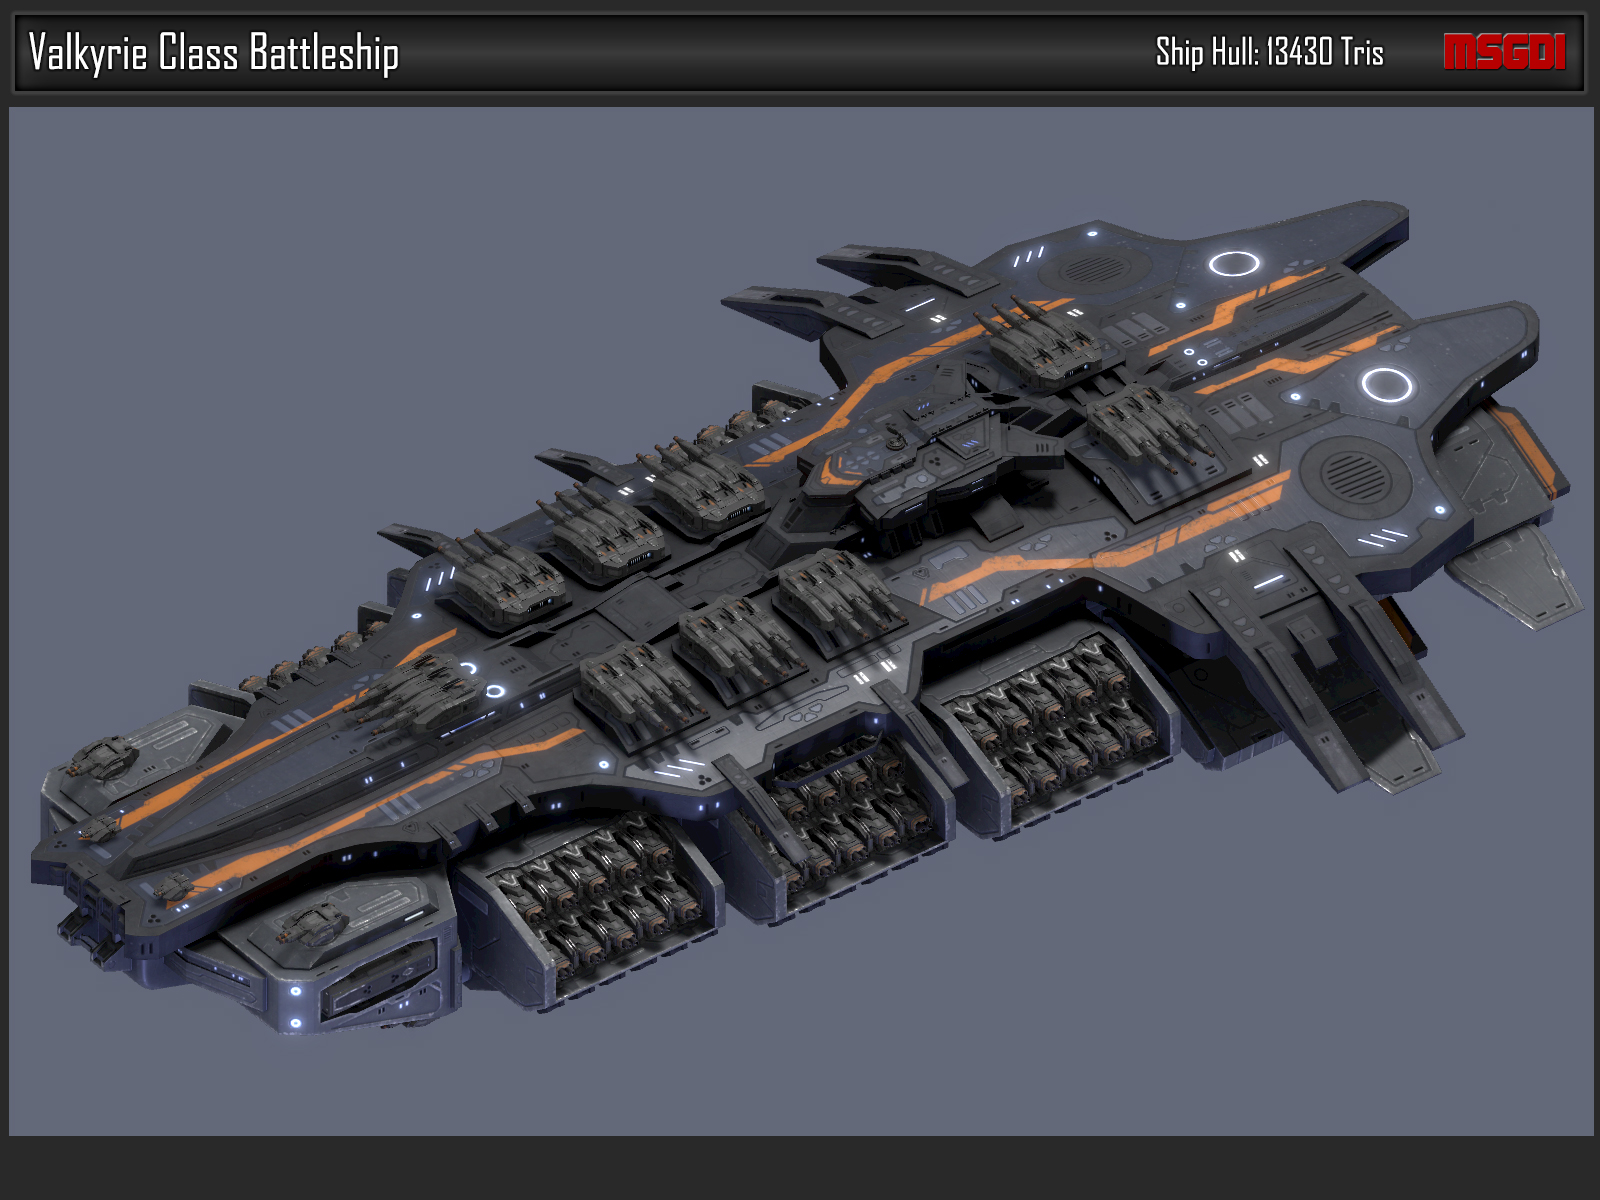 Scifi Battleship Valkyrie